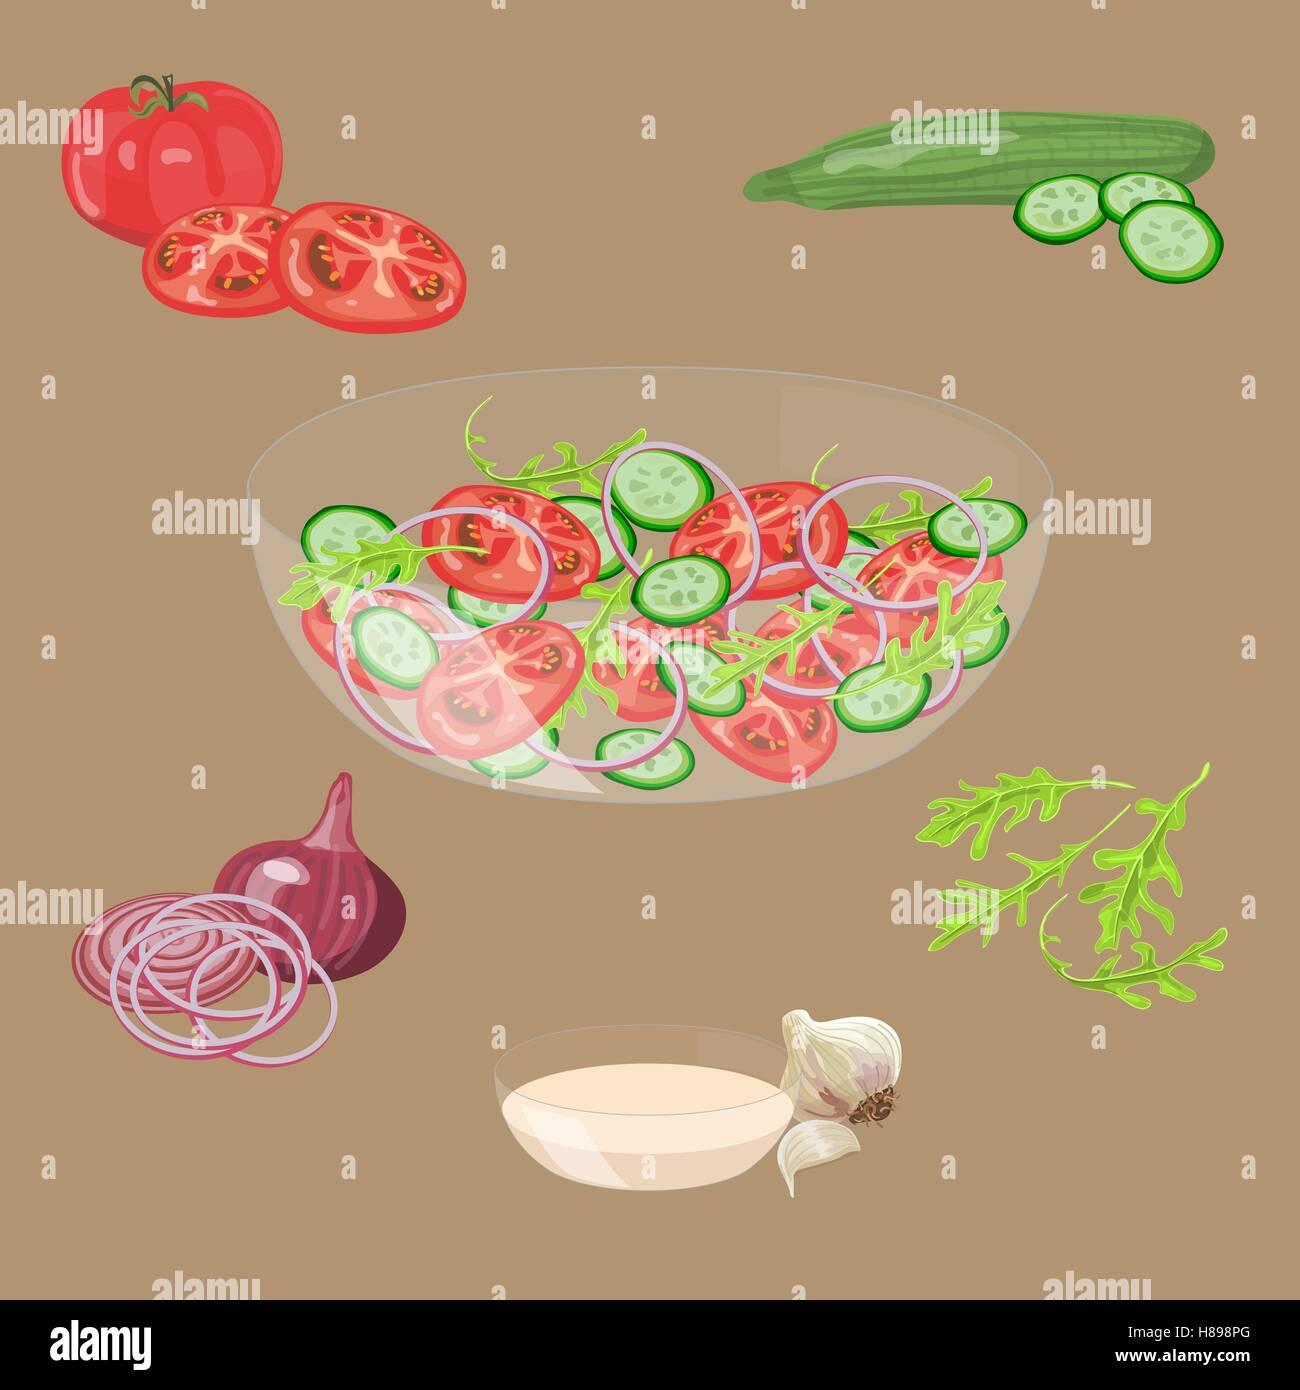 Bowl with fresh vegetables salad. Tomato, cucumber, onion, garlic, arugula. Vector illustration. EPS10. - Stock Vector